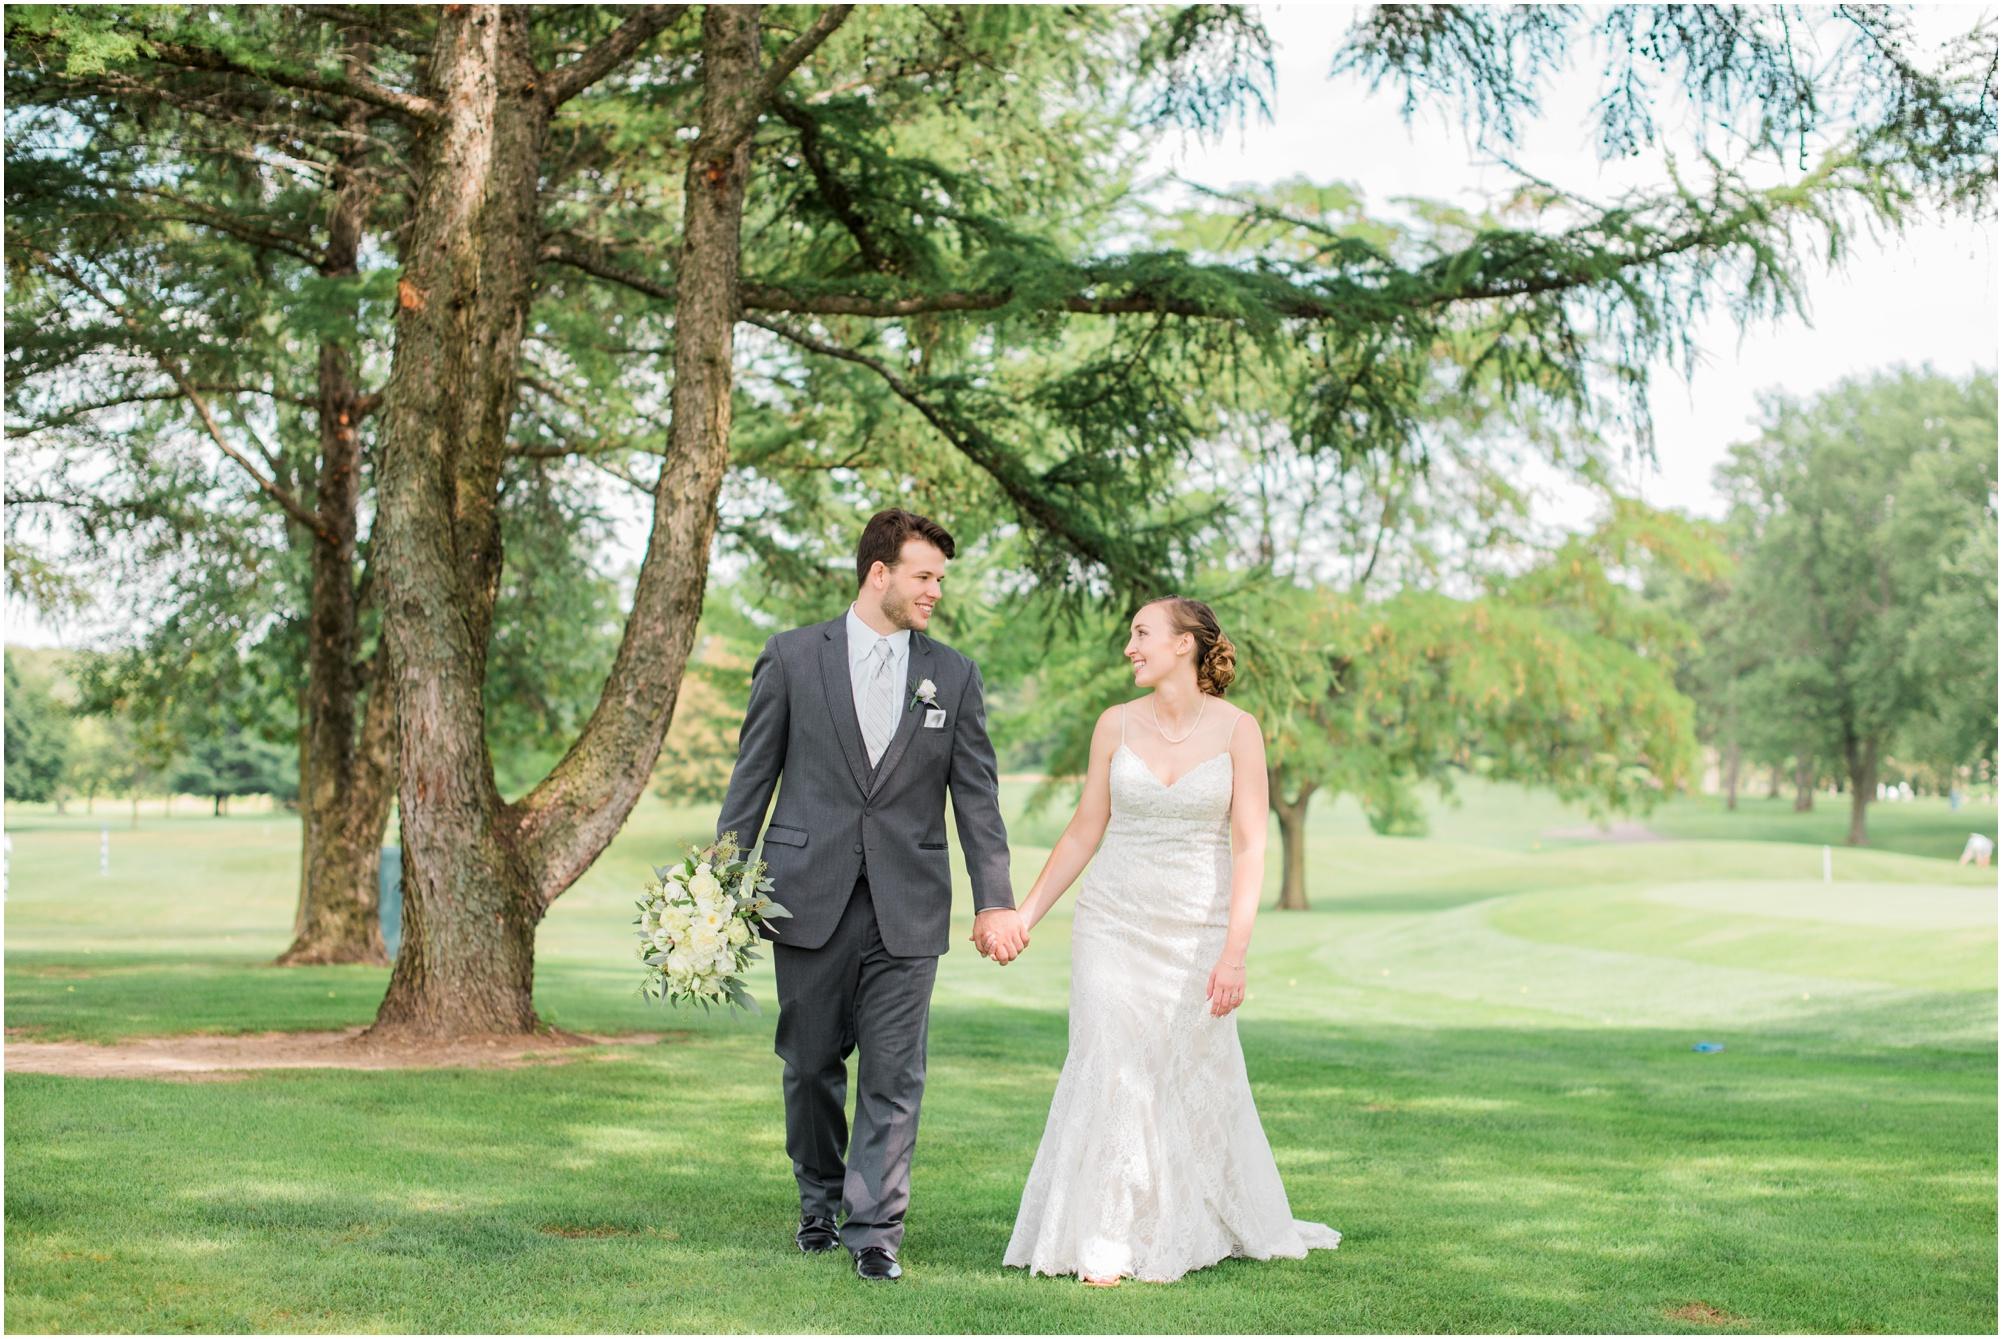 Wisconsin-Wedding-Photographer-Reedsburg-Country-Club-Kaela-and Matt-Wedding-284.jpg